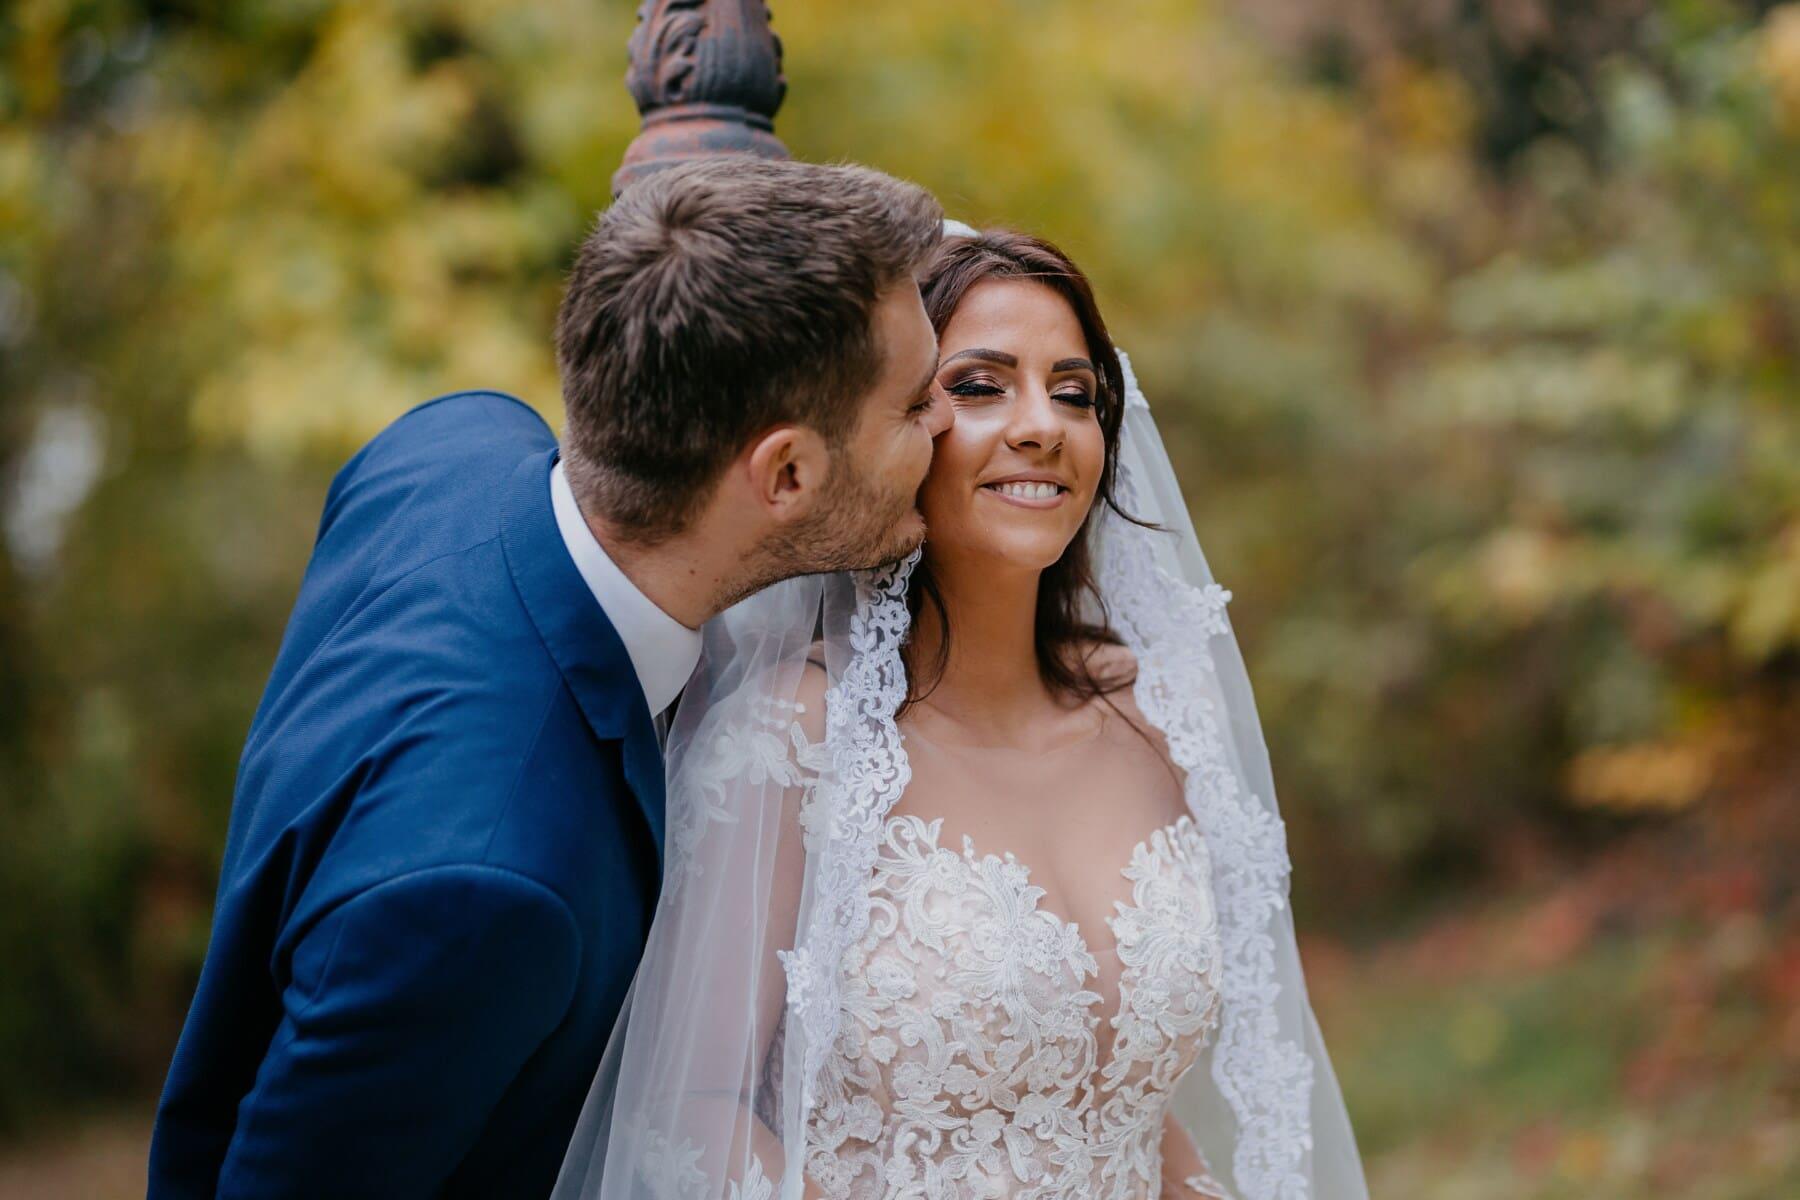 husband, wife, kiss, just married, wedding, emotion, happiness, wedding dress, married, love